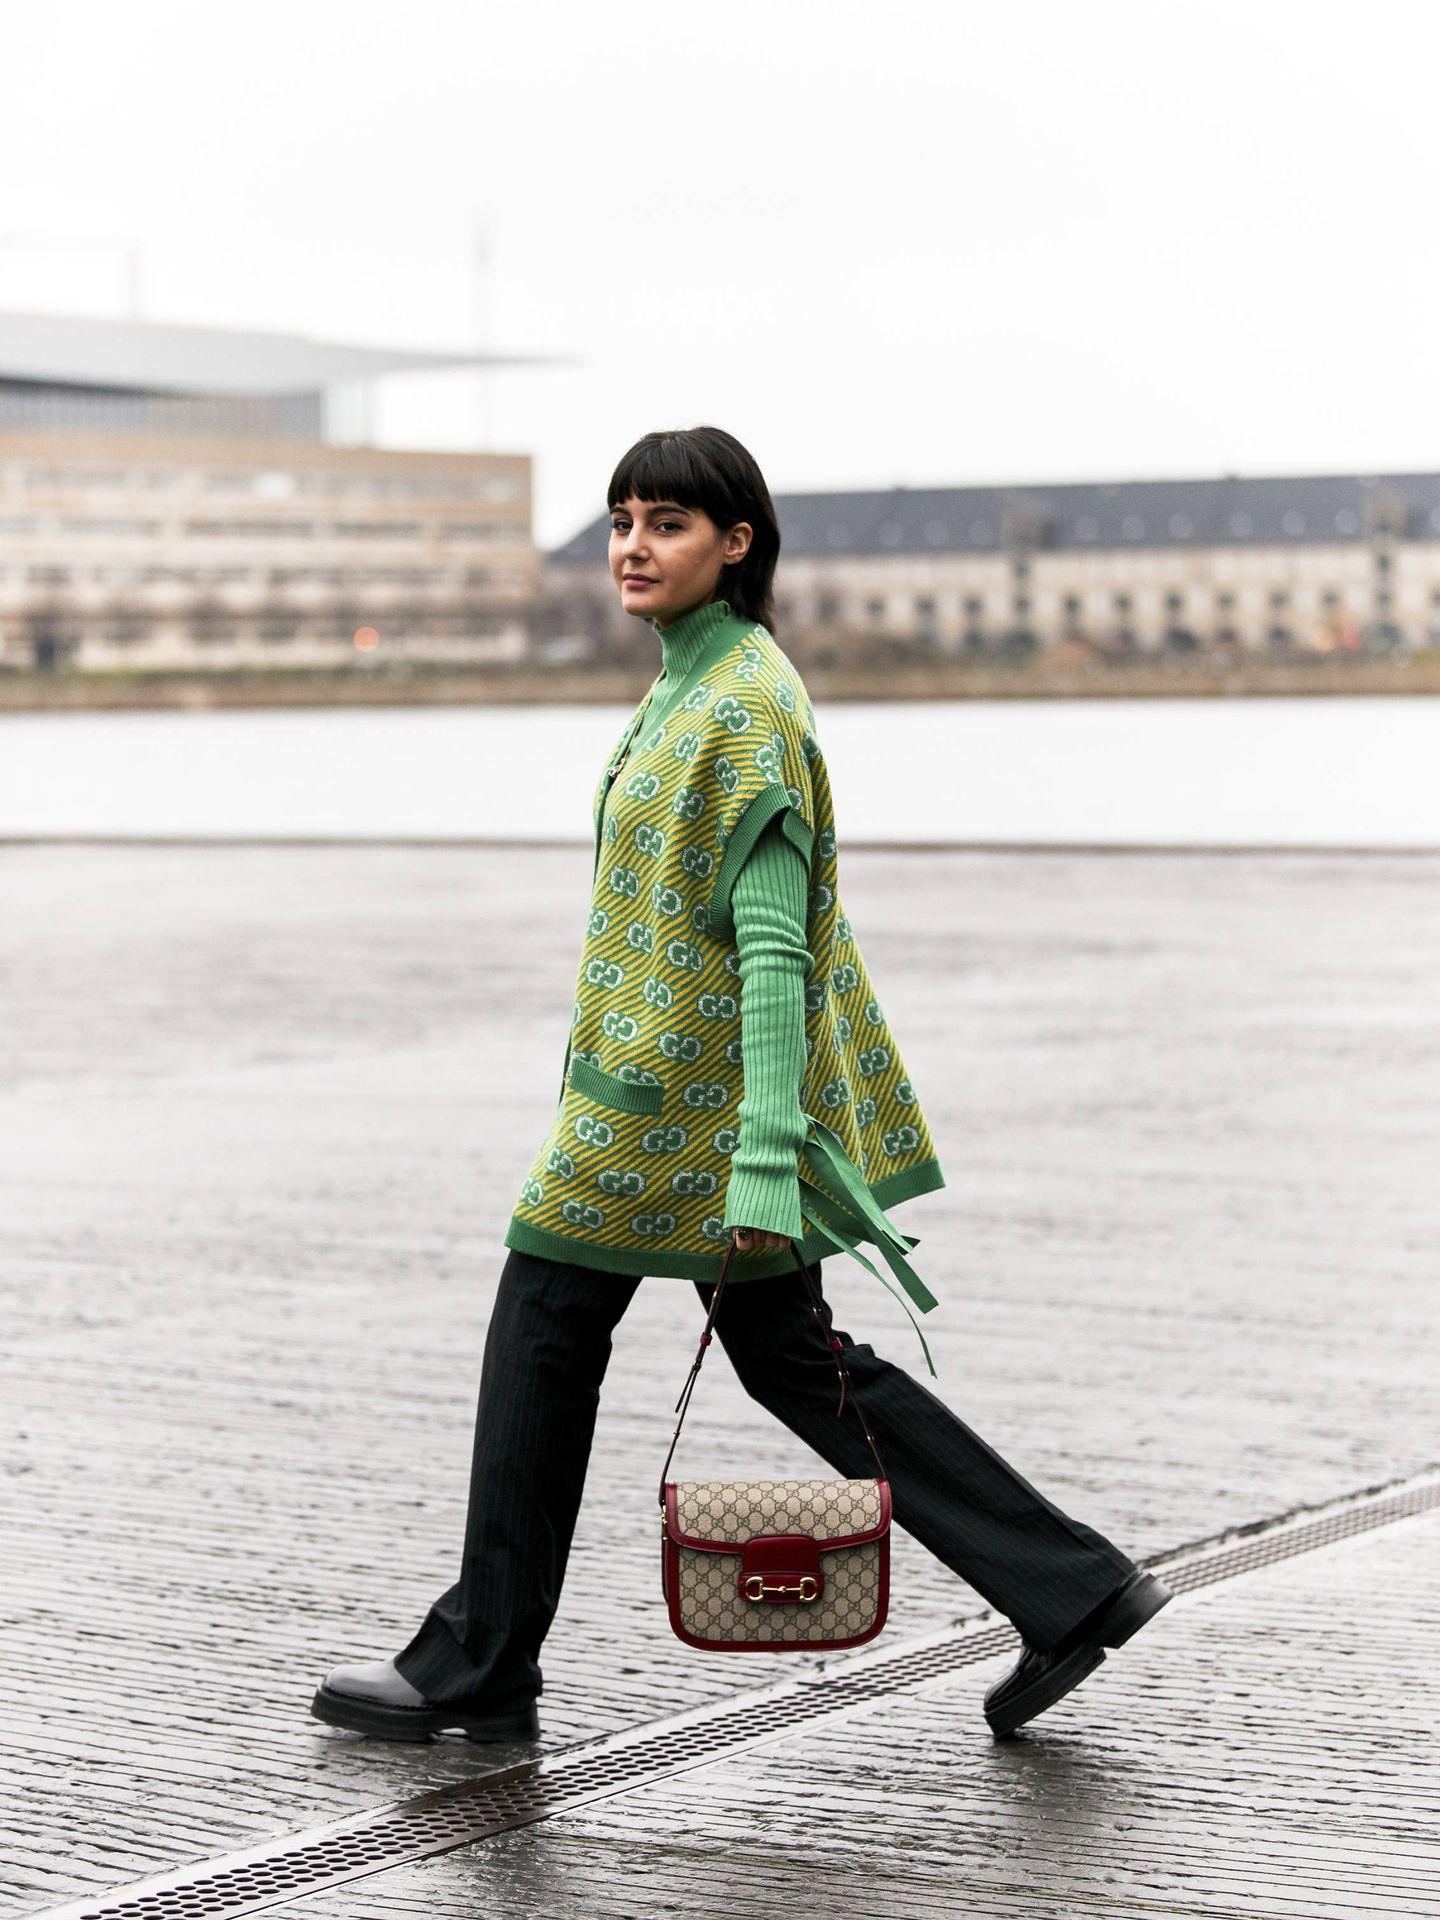 Siente el poder fashionista del verde. (Imaxtree)